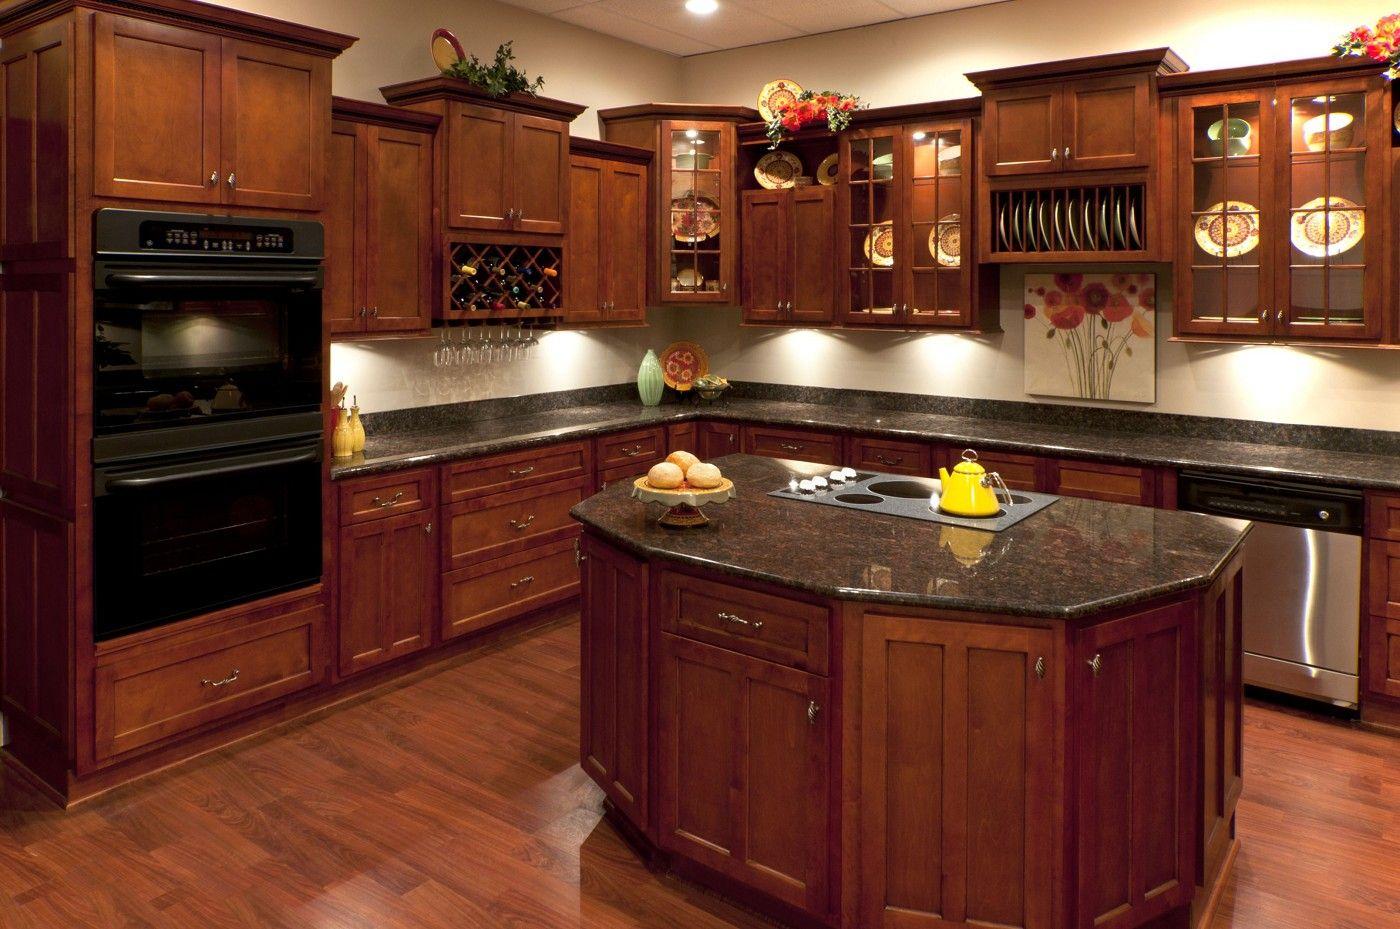 Metal Backsplashes For Kitchens Home Depot Collection Kitchen Kitchen Countertop Cabinet Kitchen In 2020 Kitchen Cabinet Design Rustic Kitchen Black Granite Kitchen